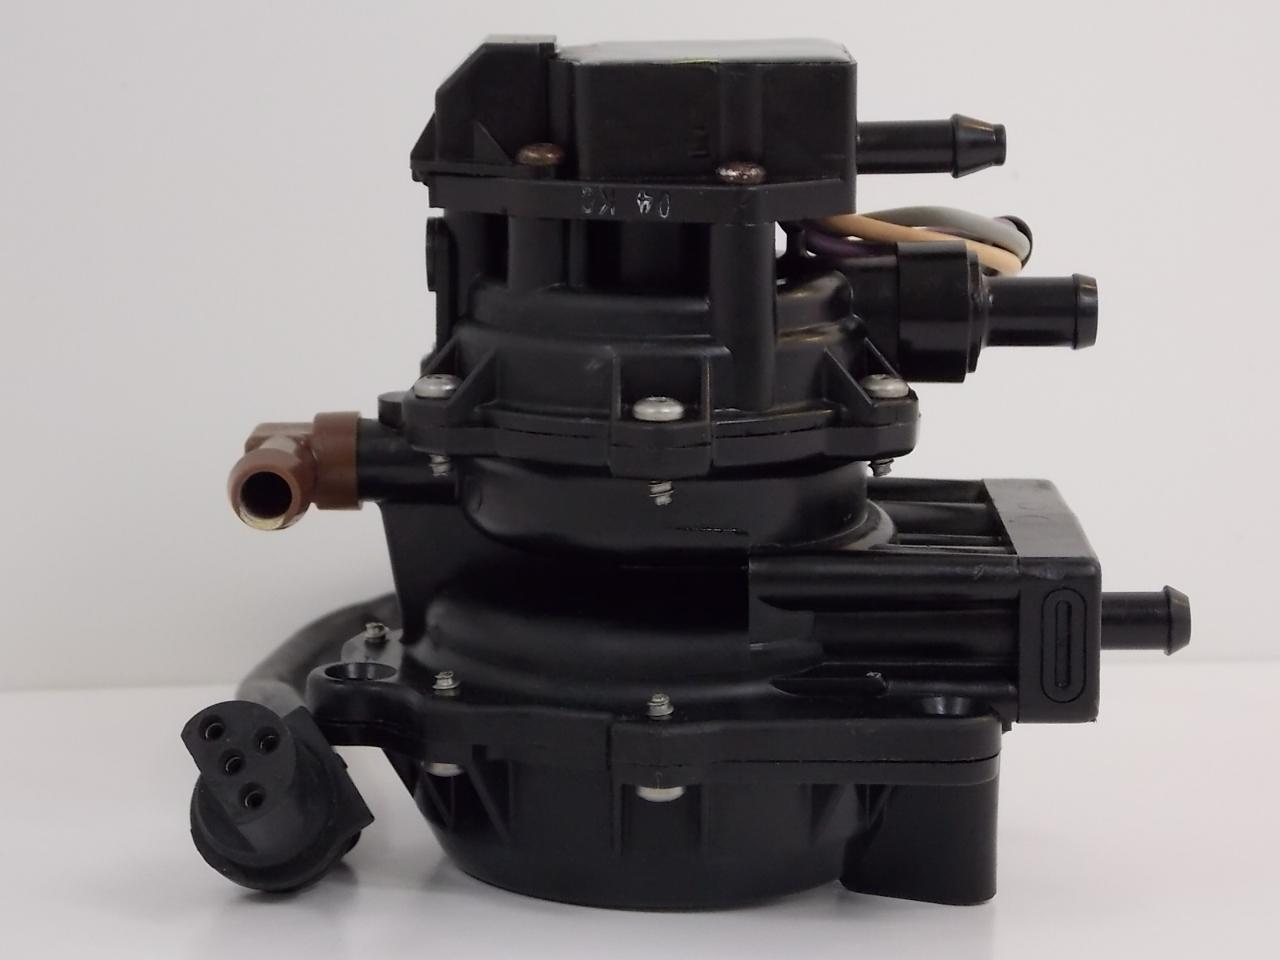 1 year warranty 1985 05 johnson evinrude 4 wire vro pump 175230 rh southcentraloutboards com VRO Pump Diagram VRO Pump Problems